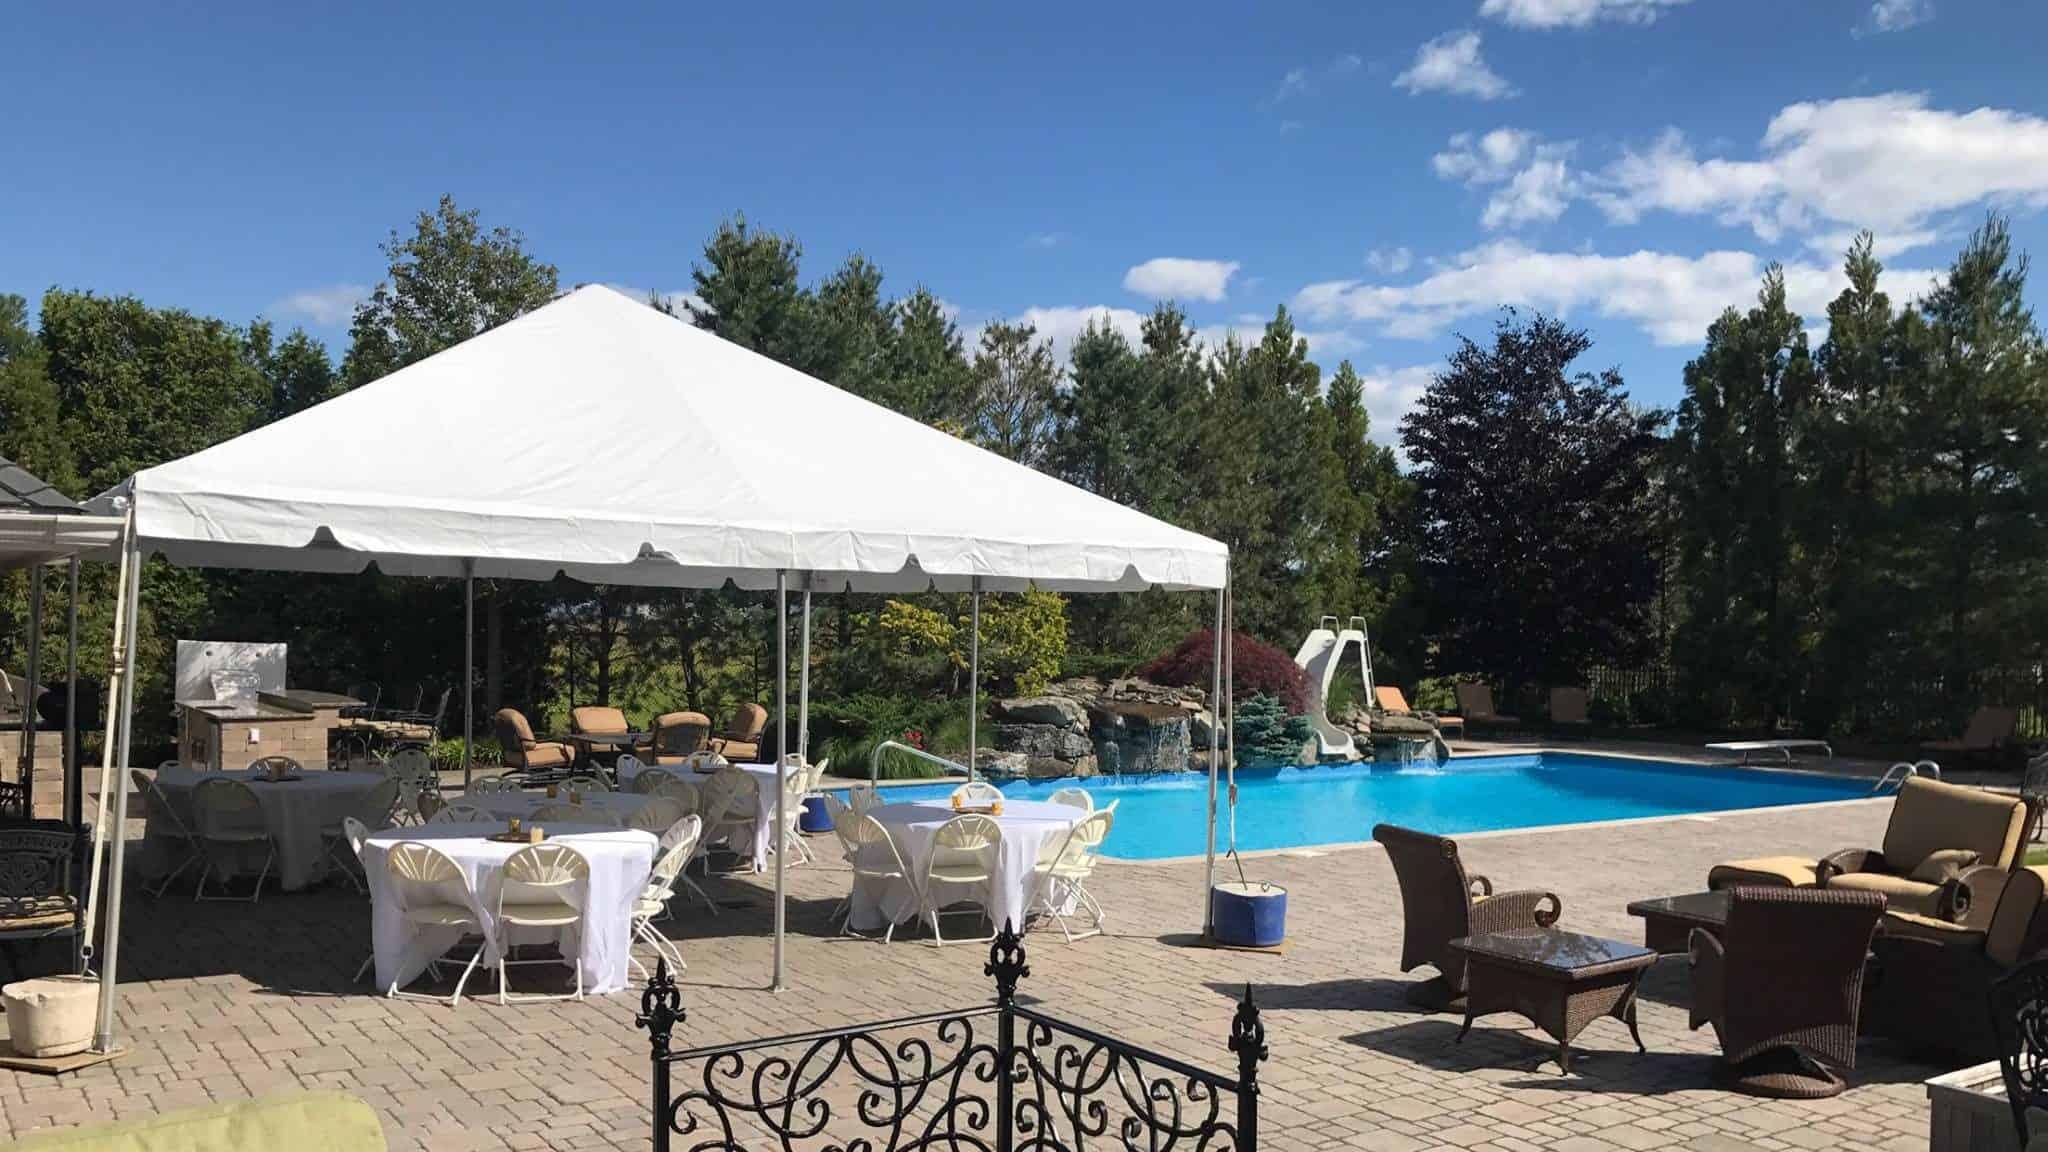 backyard tent rental setup next to pool